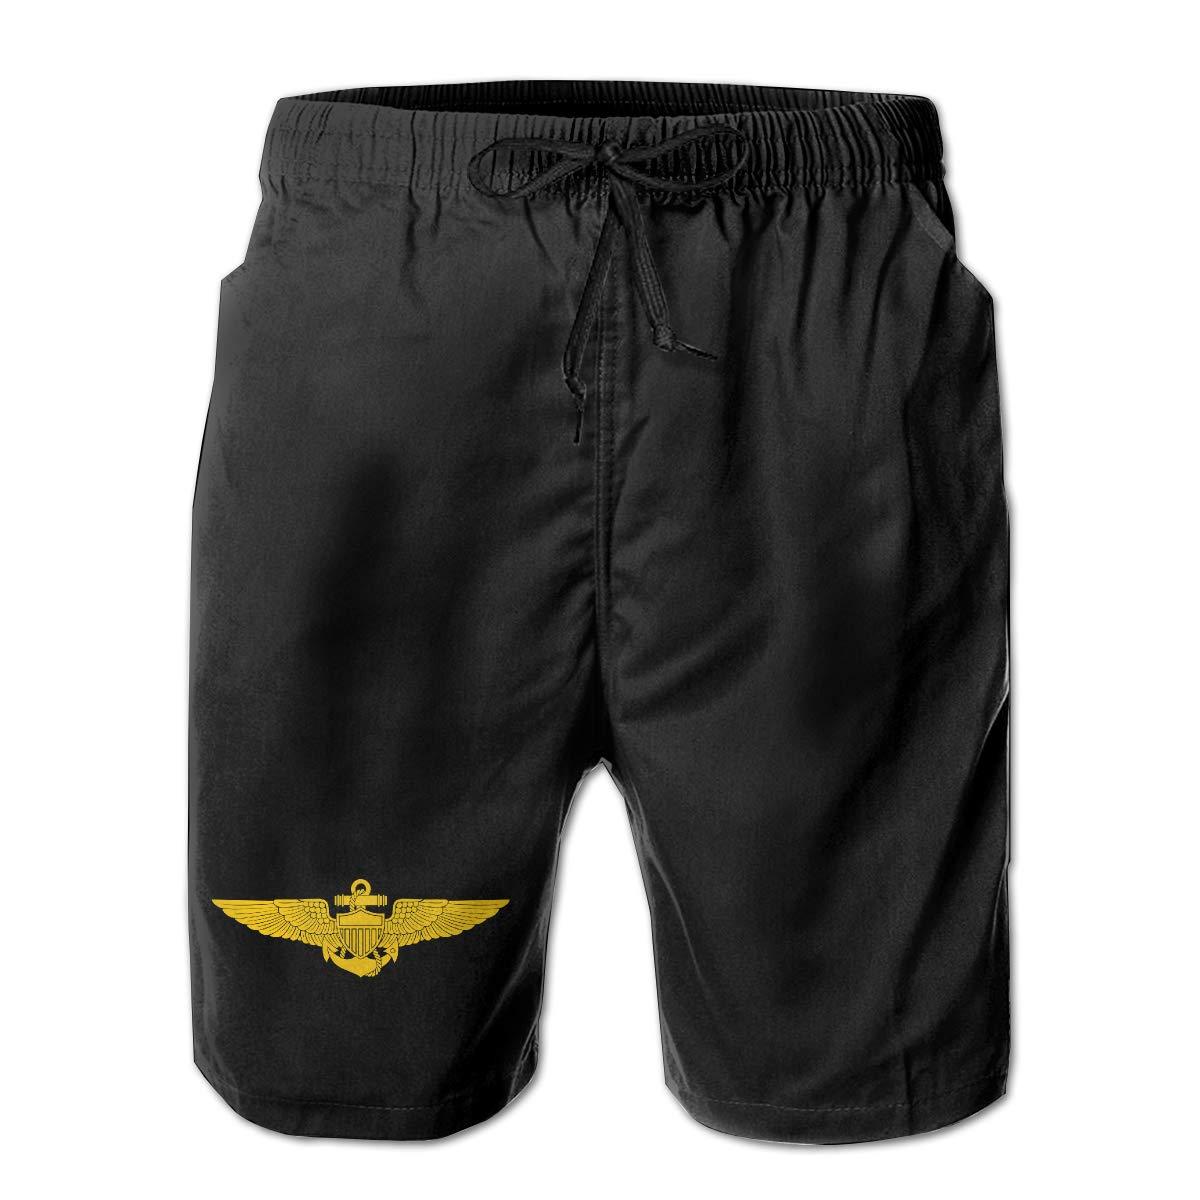 US Navy Pilot Wings Men Summer Casual Shorts,Beach Shorts Board Shorts